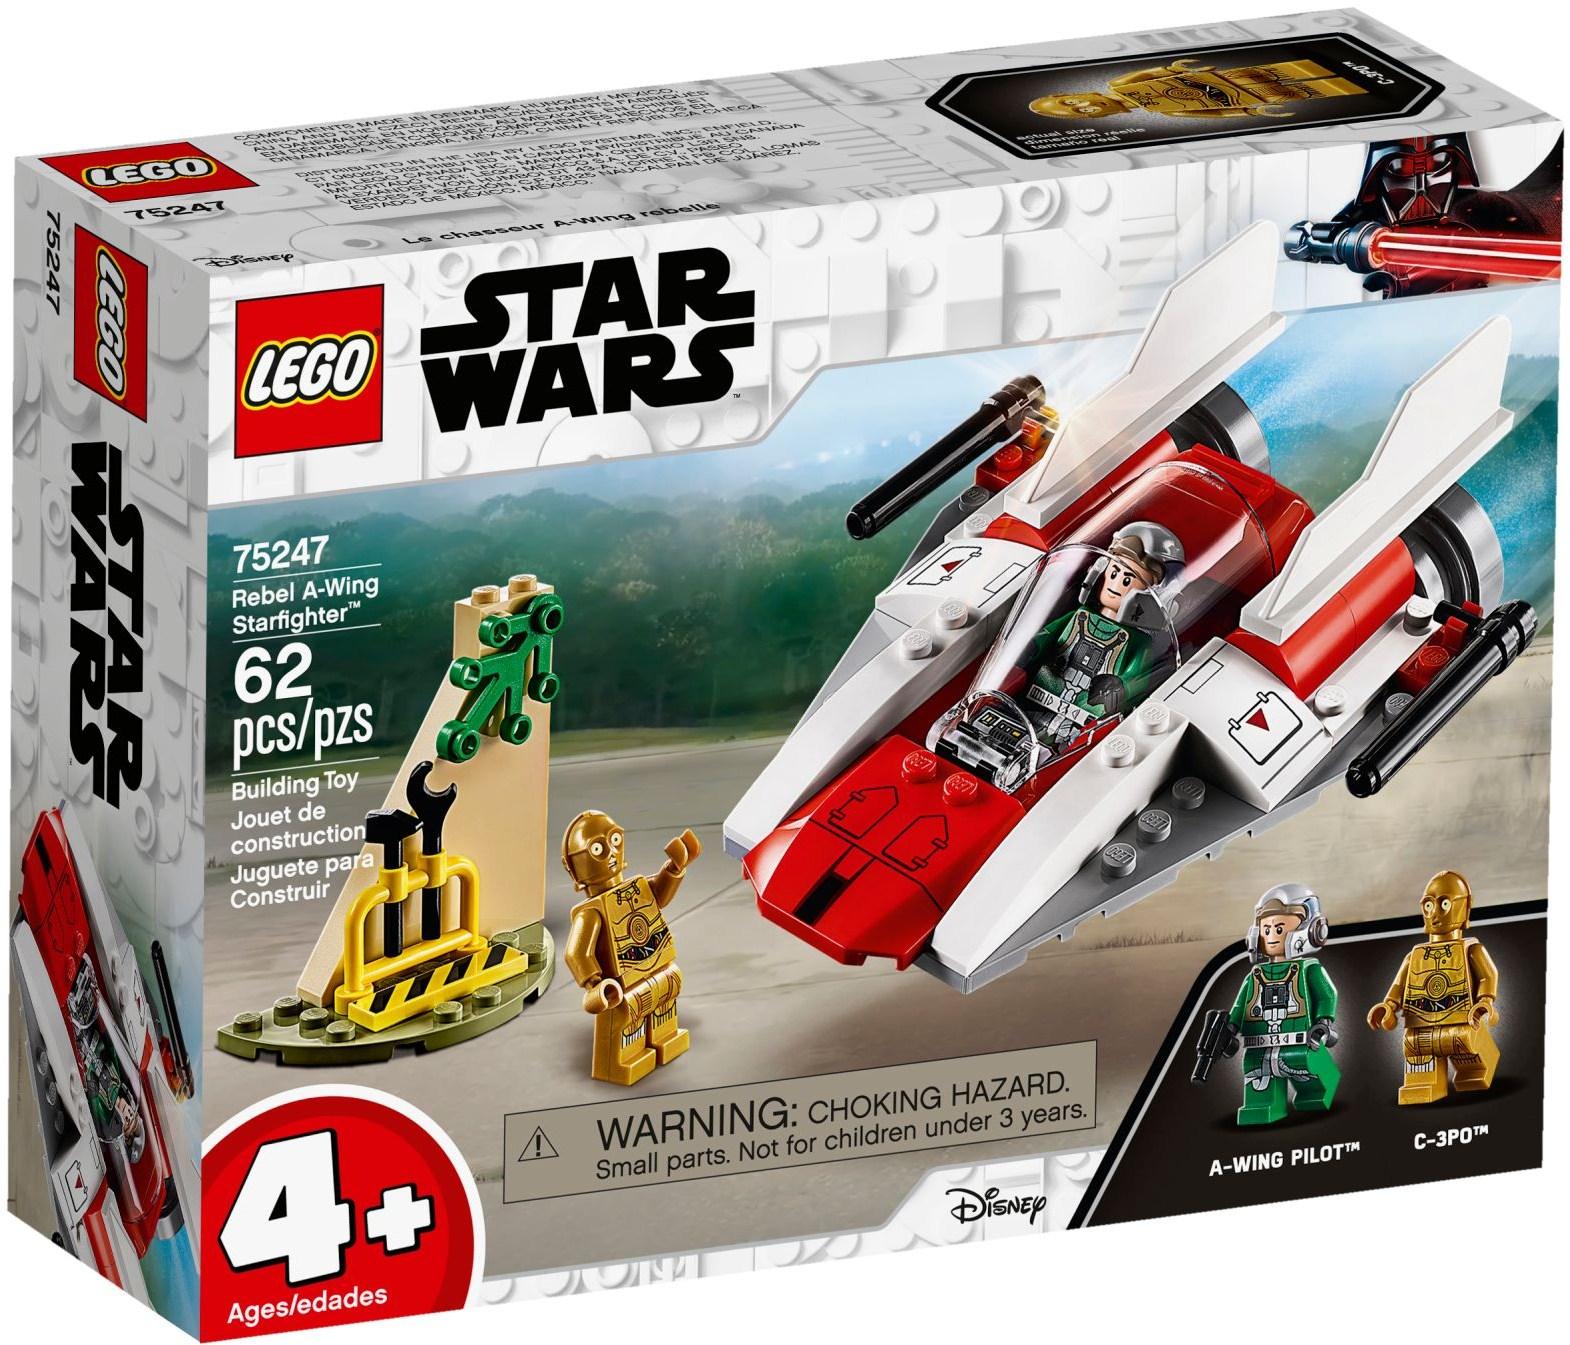 75247 Rebel A-Wing Starfighter